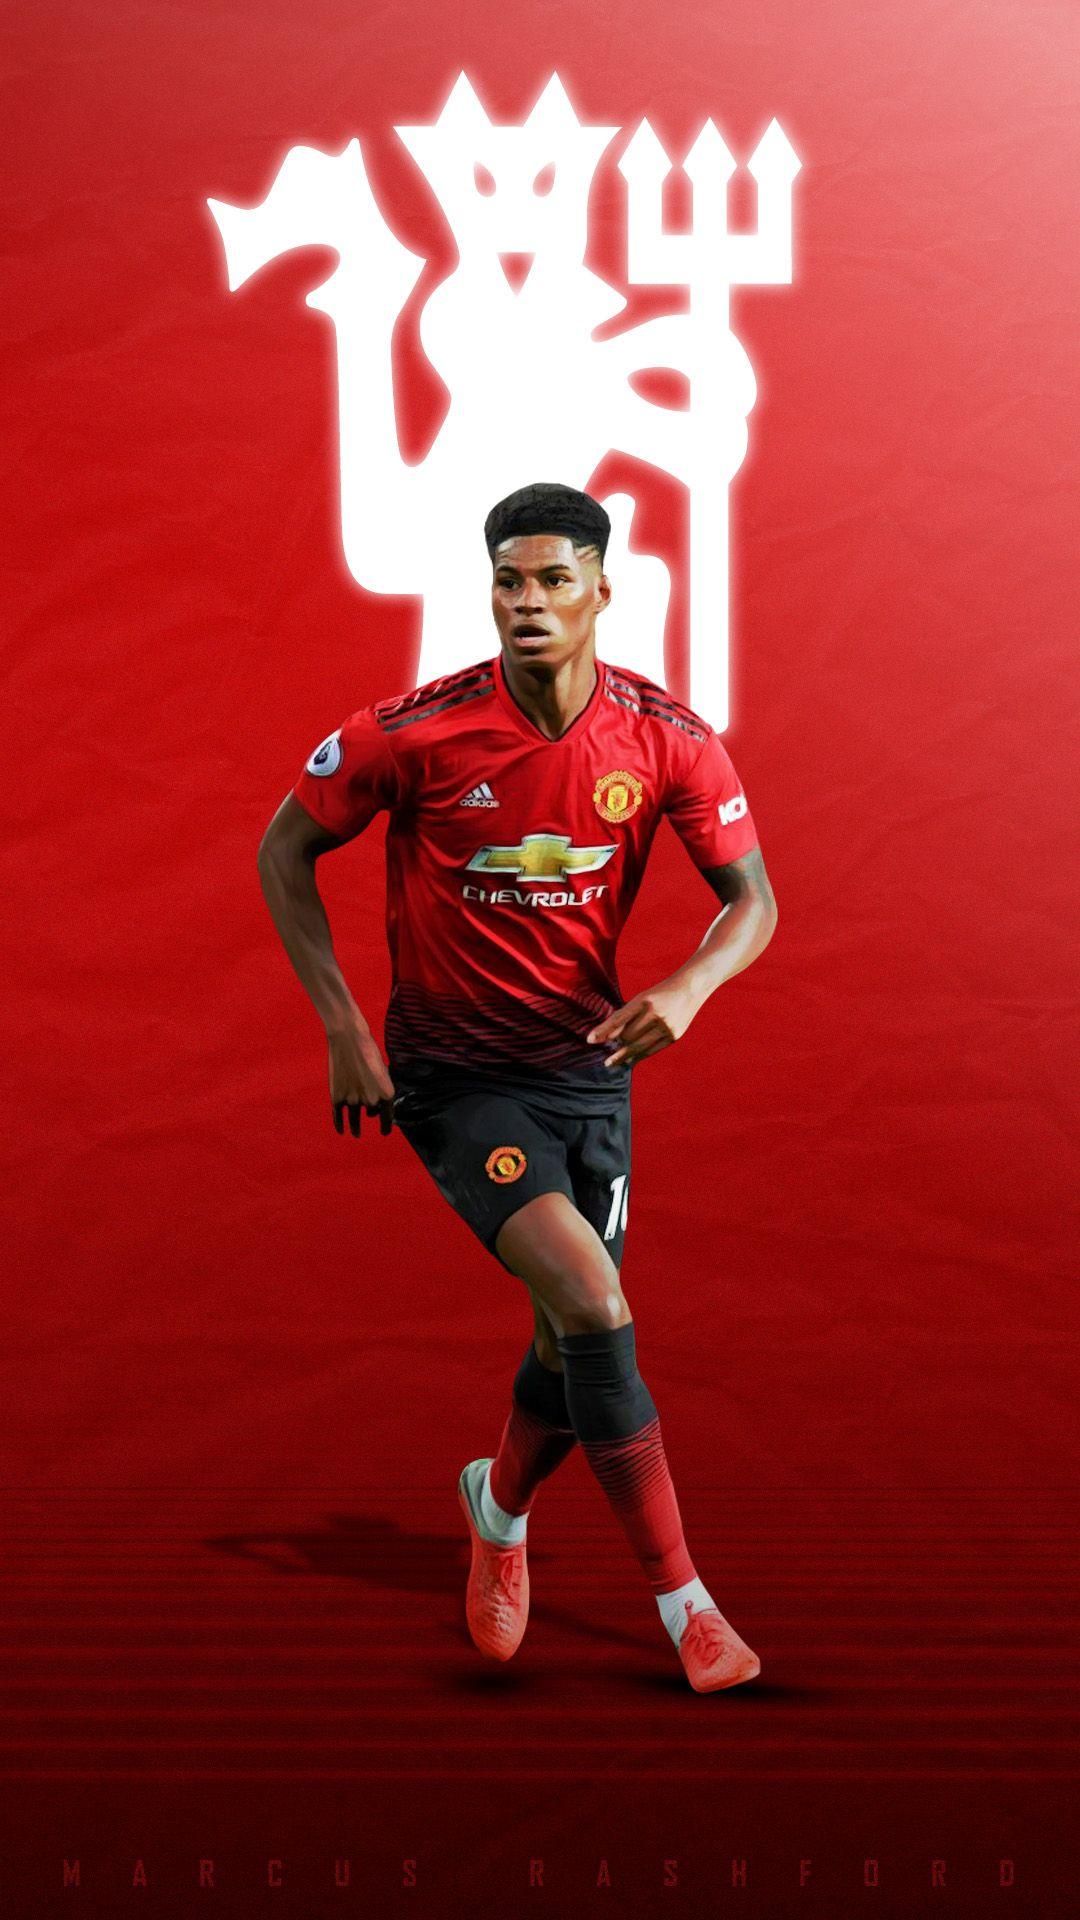 Marcus Rashford Manchester United Manchester United Logo Manchester United Players Manchester United